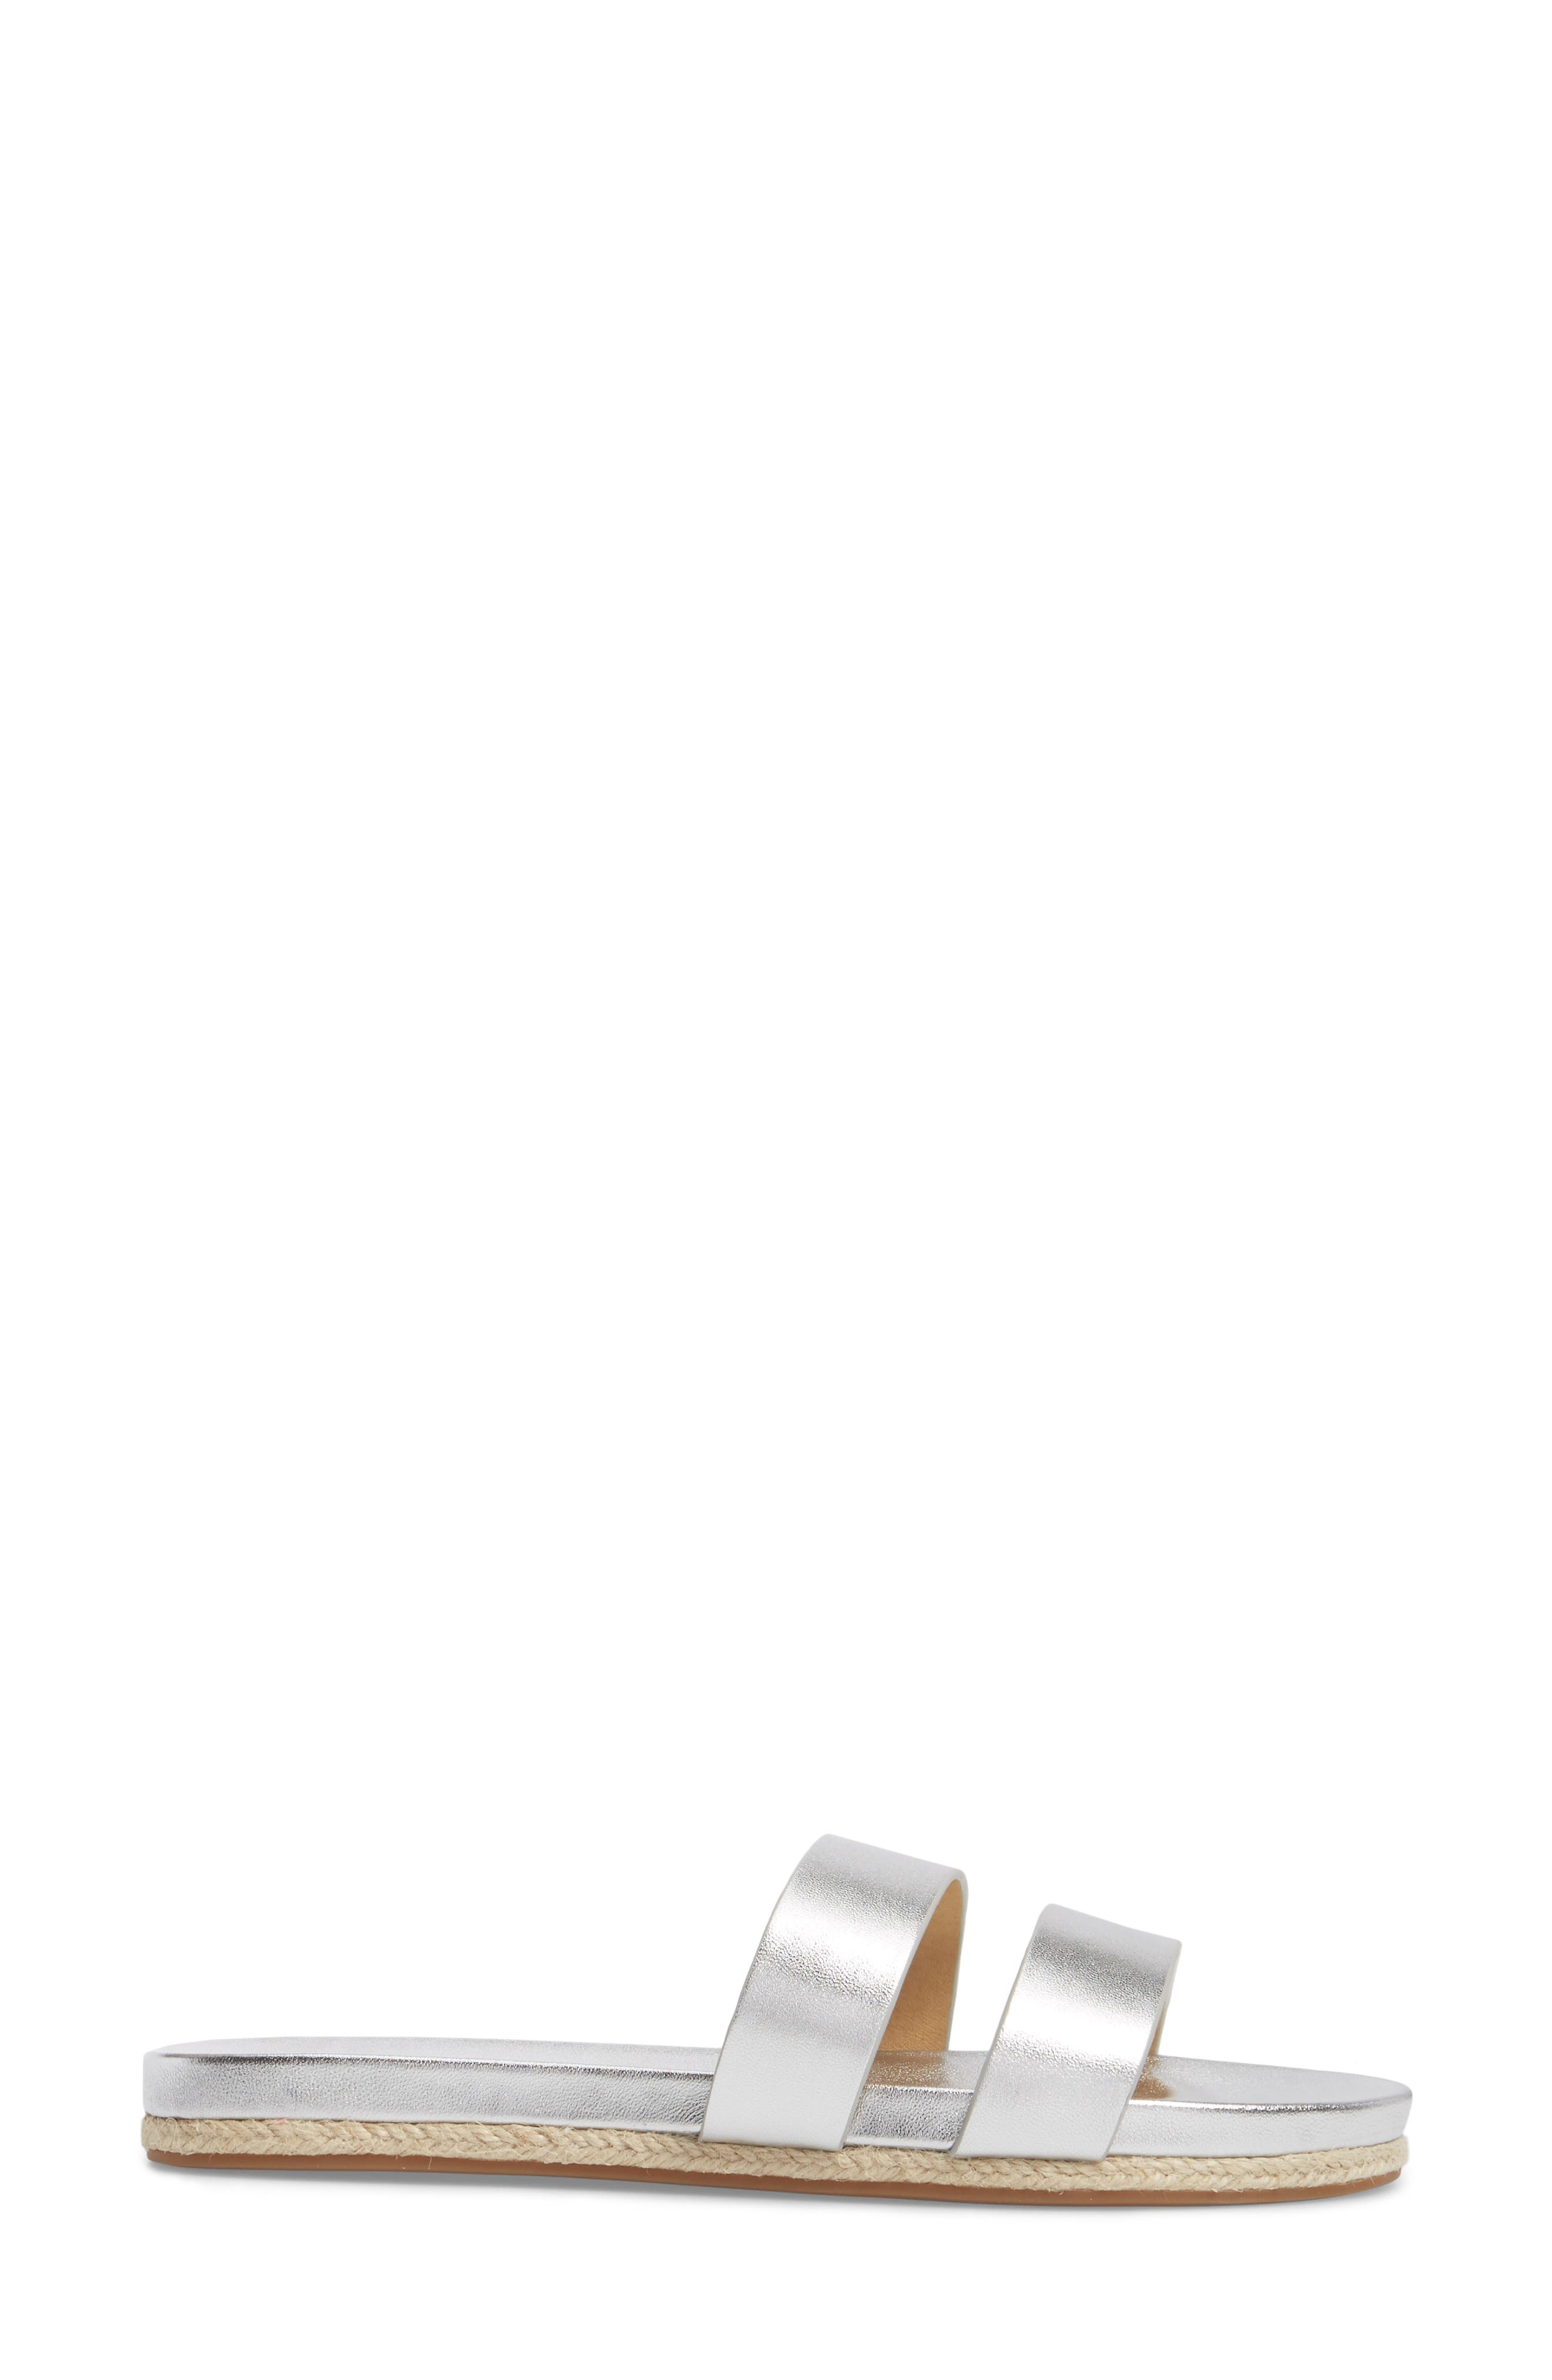 Brittani Slide Sandal,                             Alternate thumbnail 3, color,                             Silver Metallic Leather